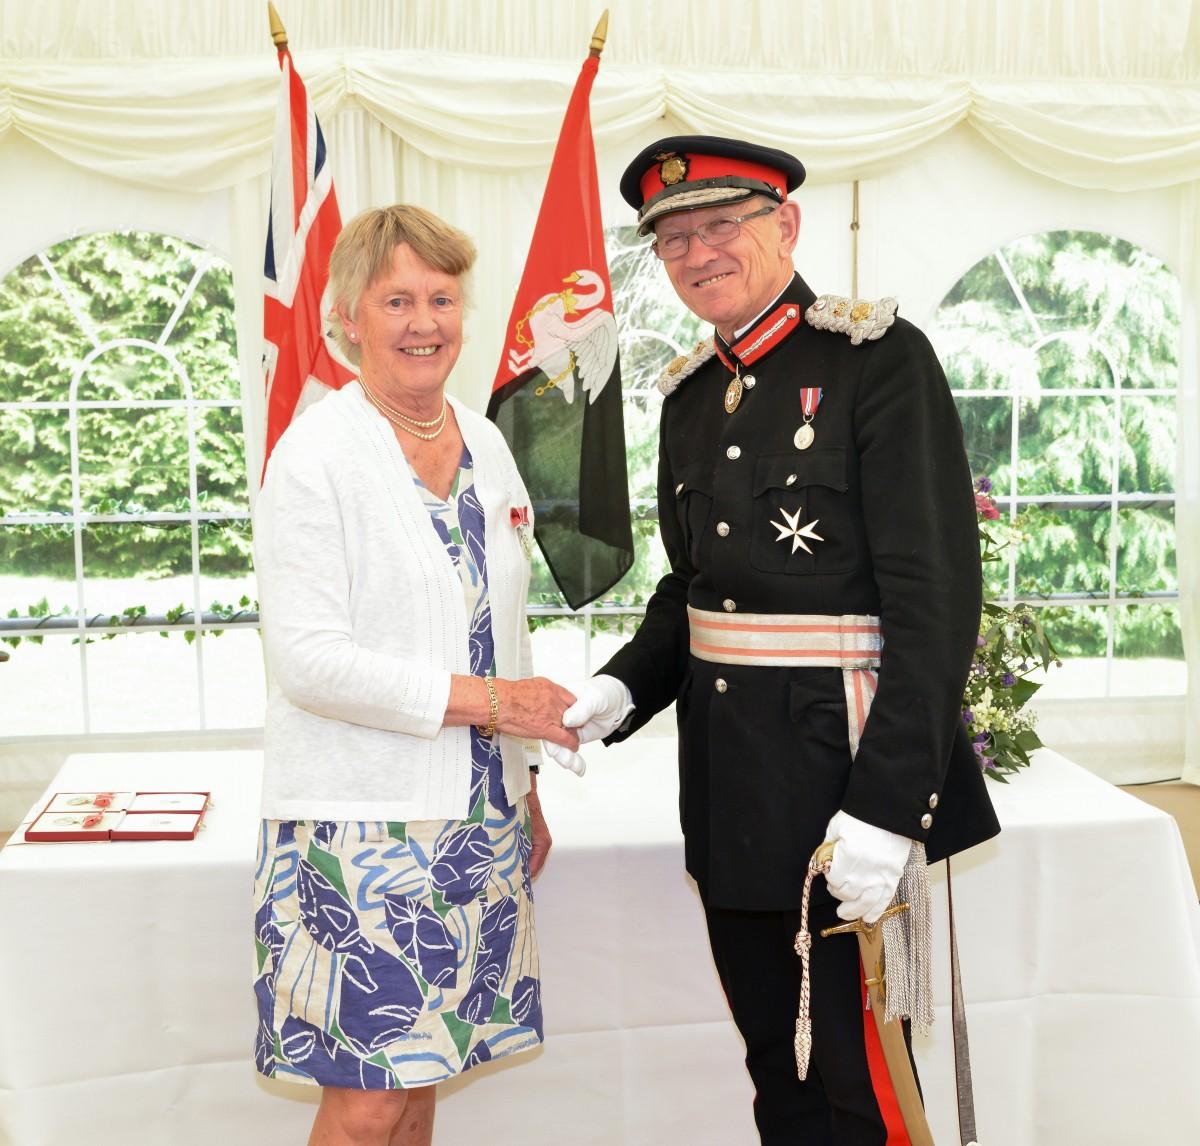 Alison Rae of Marlow receives her BEM